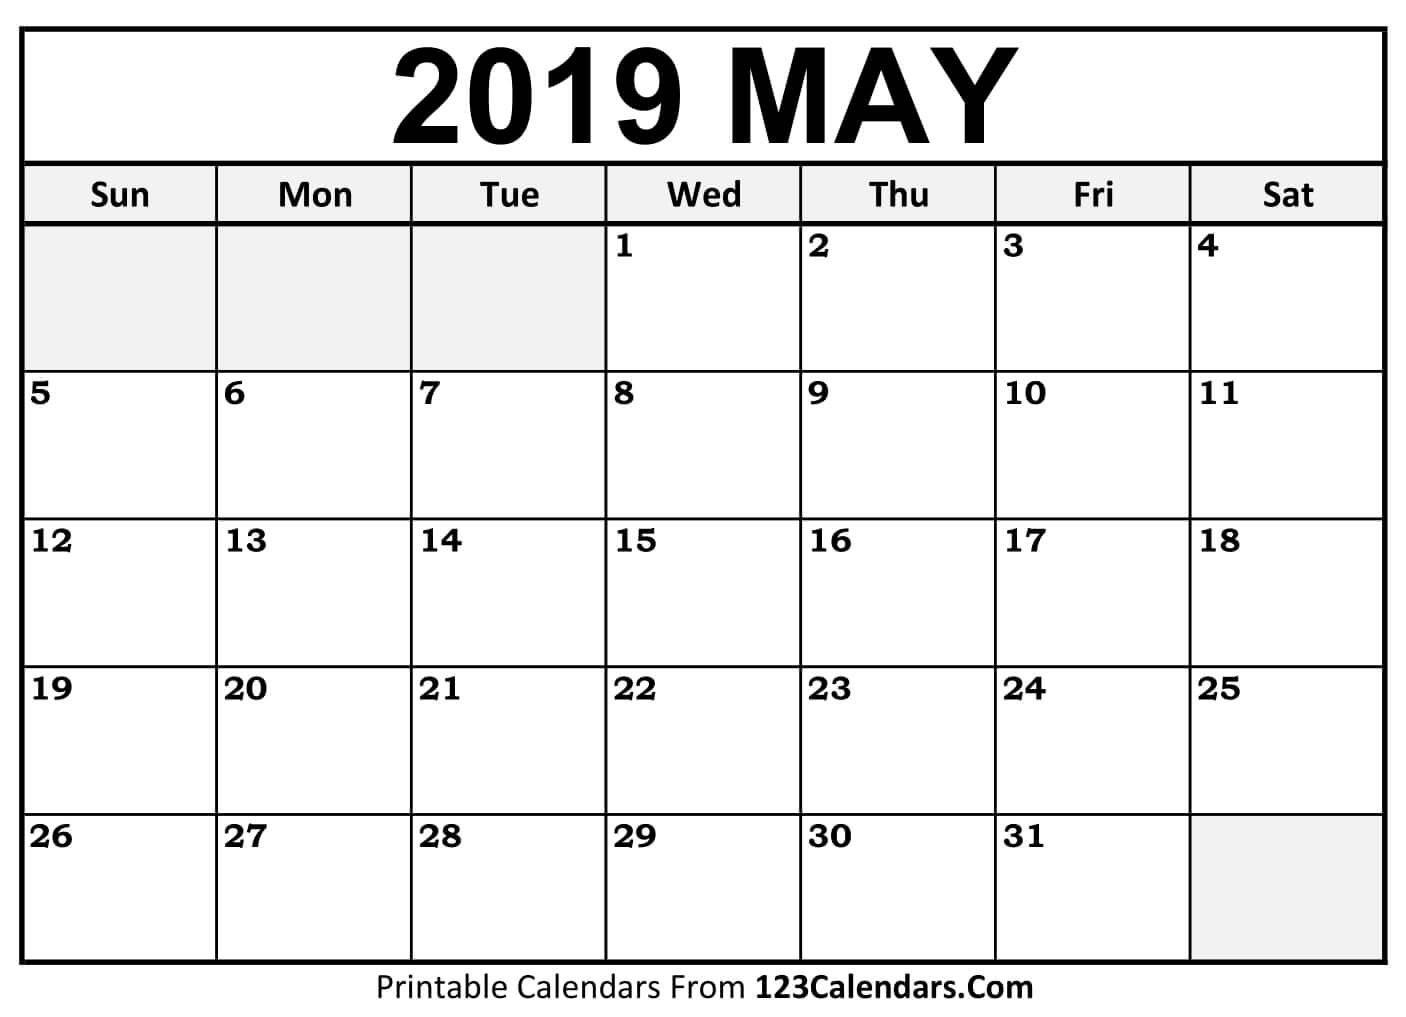 Printable May 2019 Calendar Templates - 123Calendars Calendar May 4 2019